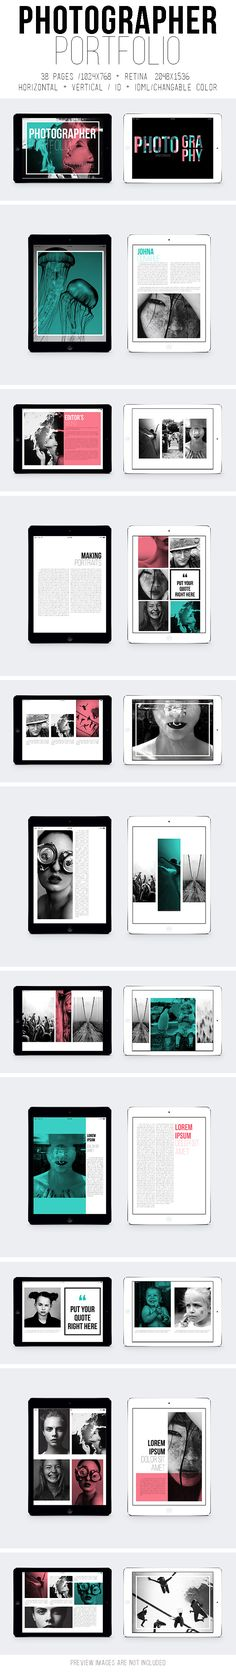 Tablet Photographer Portfolio on Behance